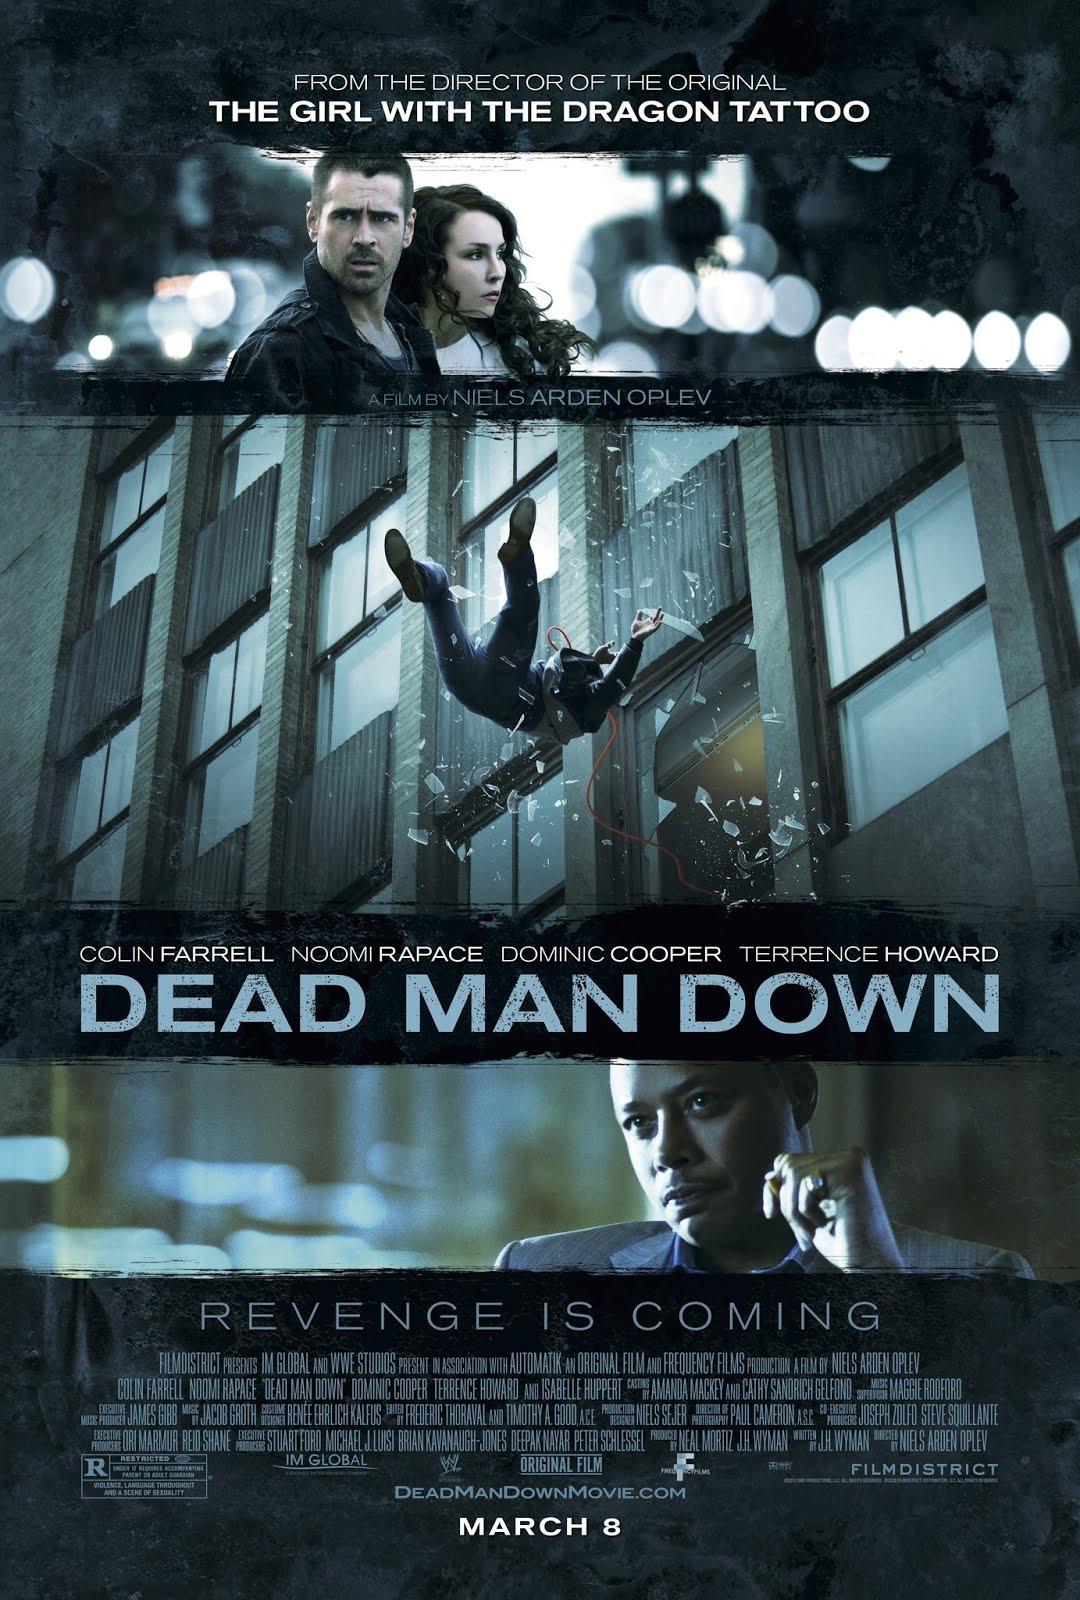 Dead Man Down - Movie Poster #3 (Original)